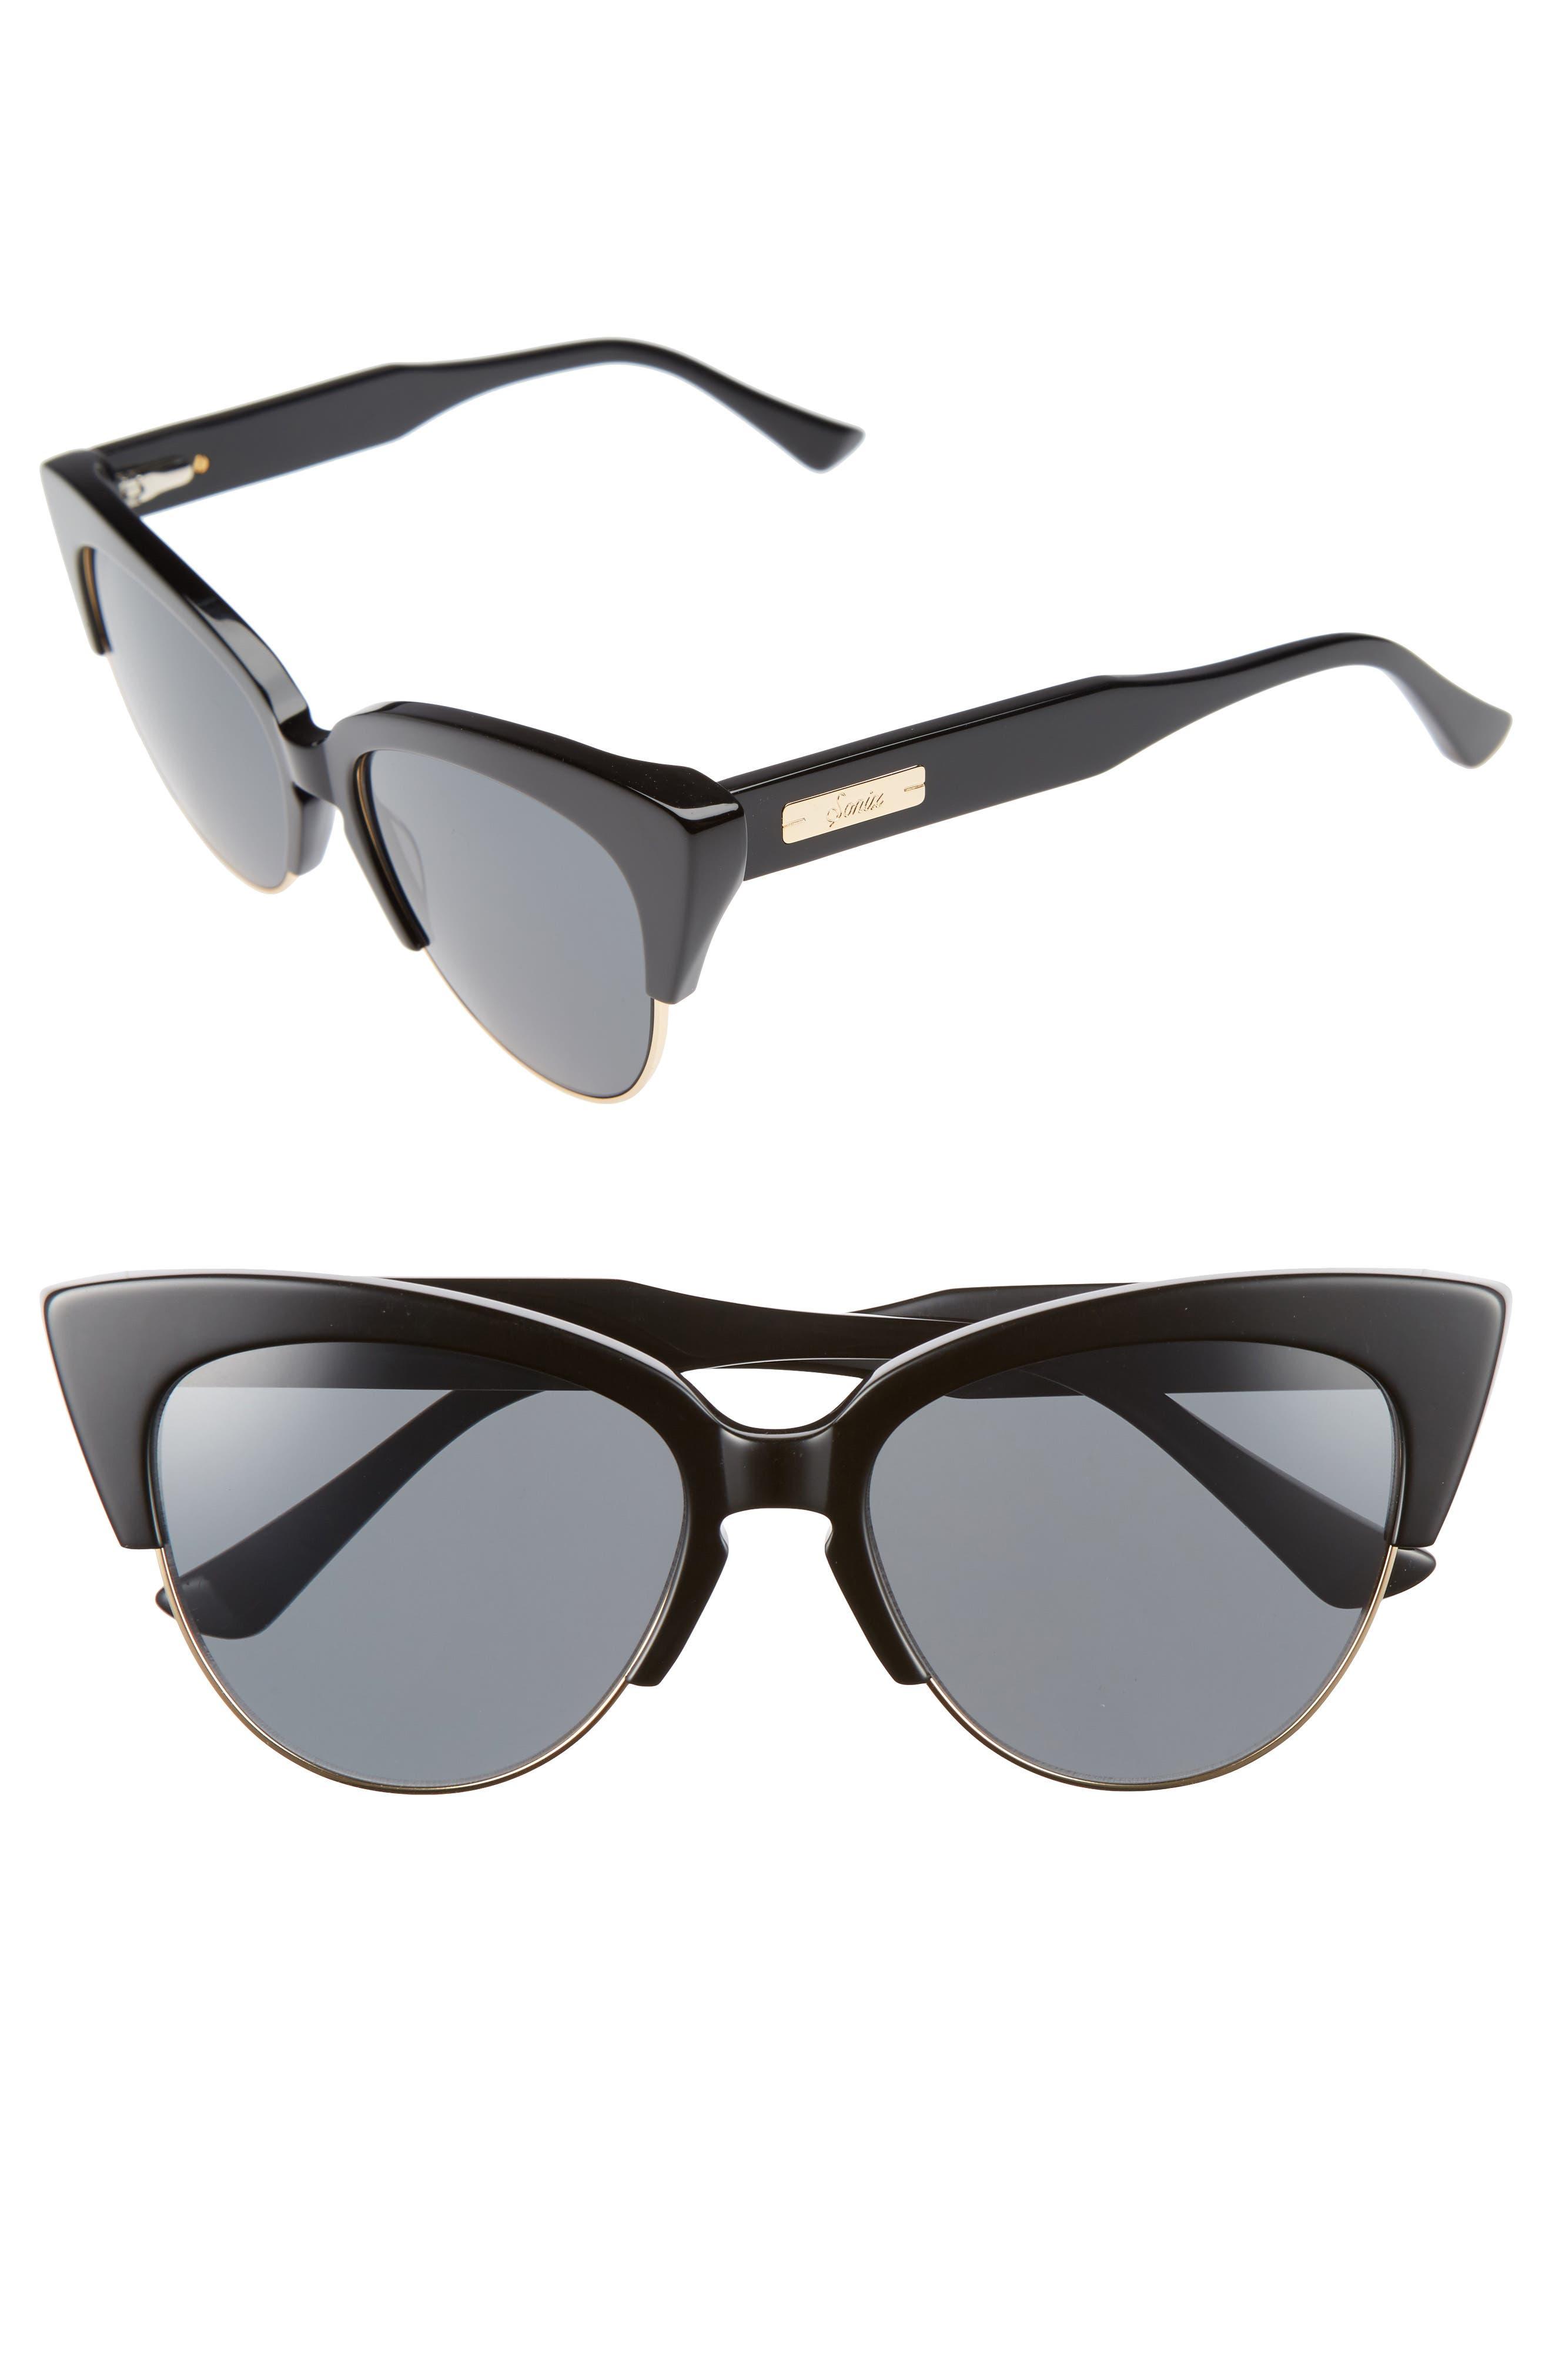 Dafni 56mm Gradient Cat Eye Sunglasses,                             Main thumbnail 1, color,                             001